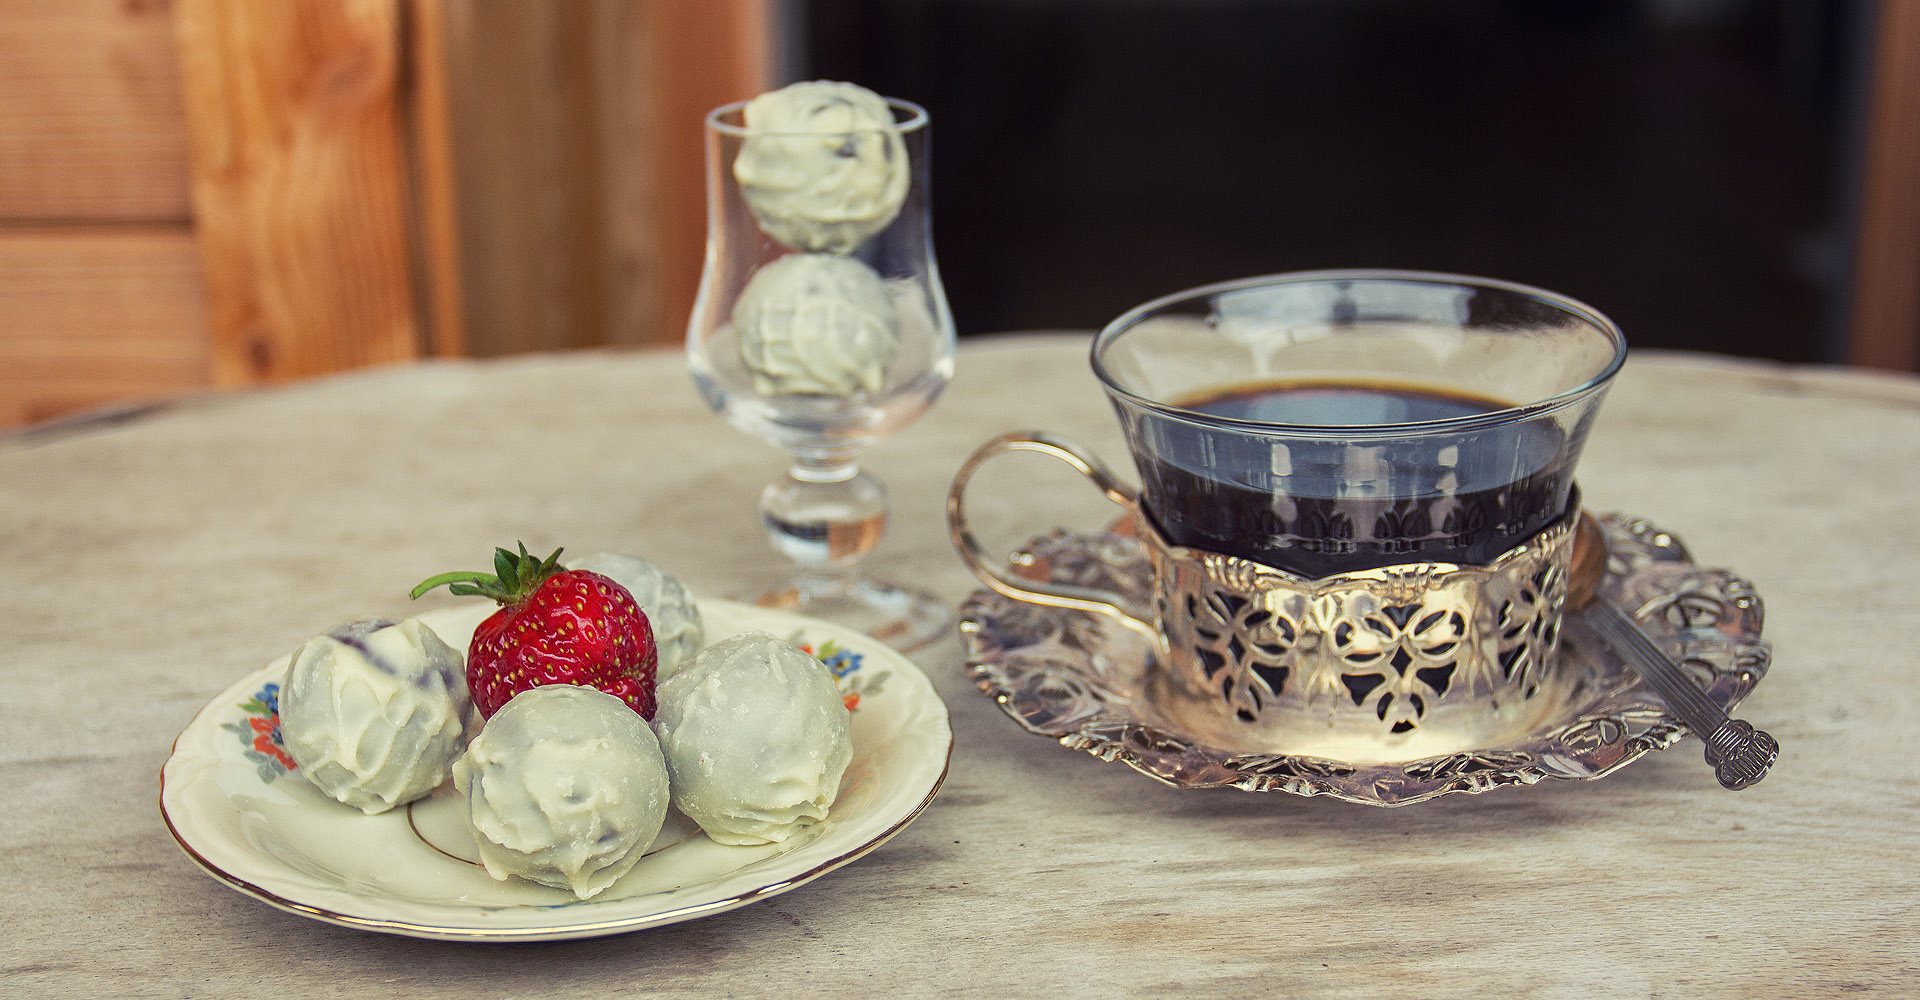 Kaffepraline